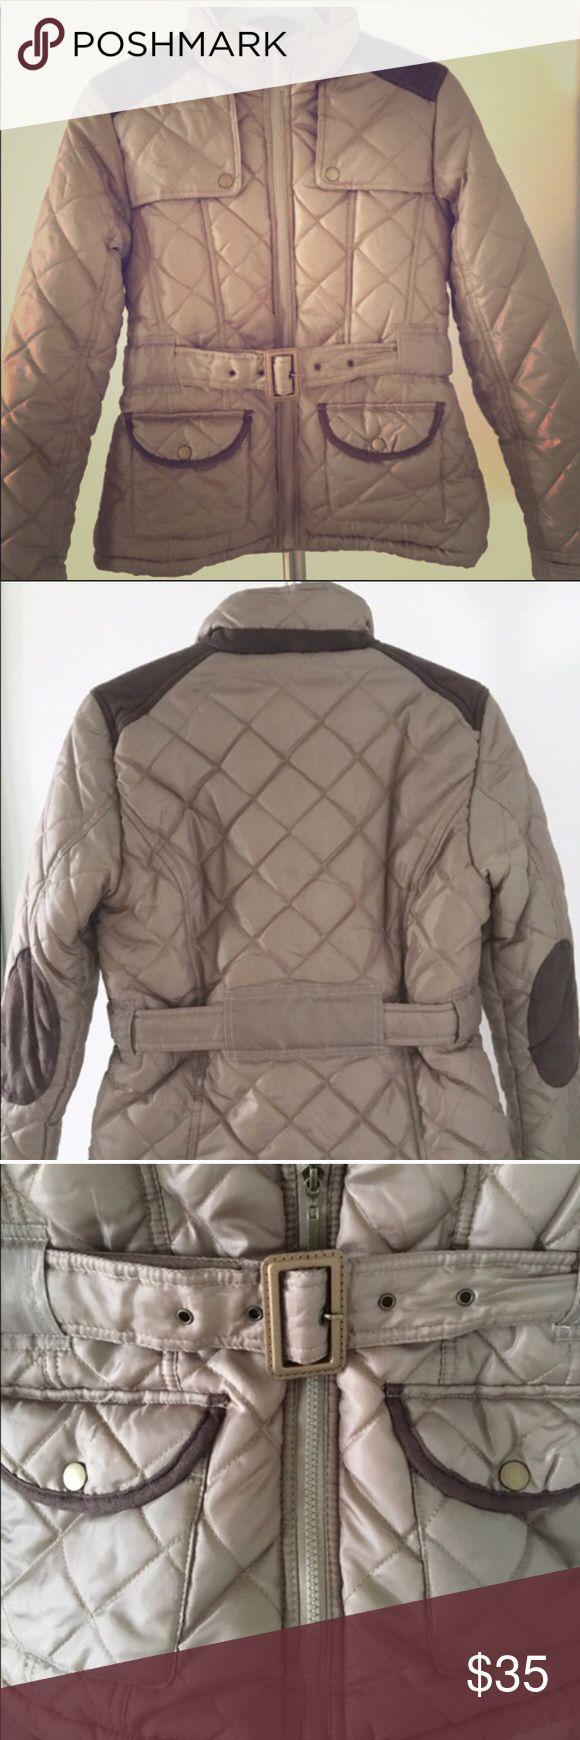 Nedium Jacket by Yokd with elbow patches Jacket yok Jackets & Coats